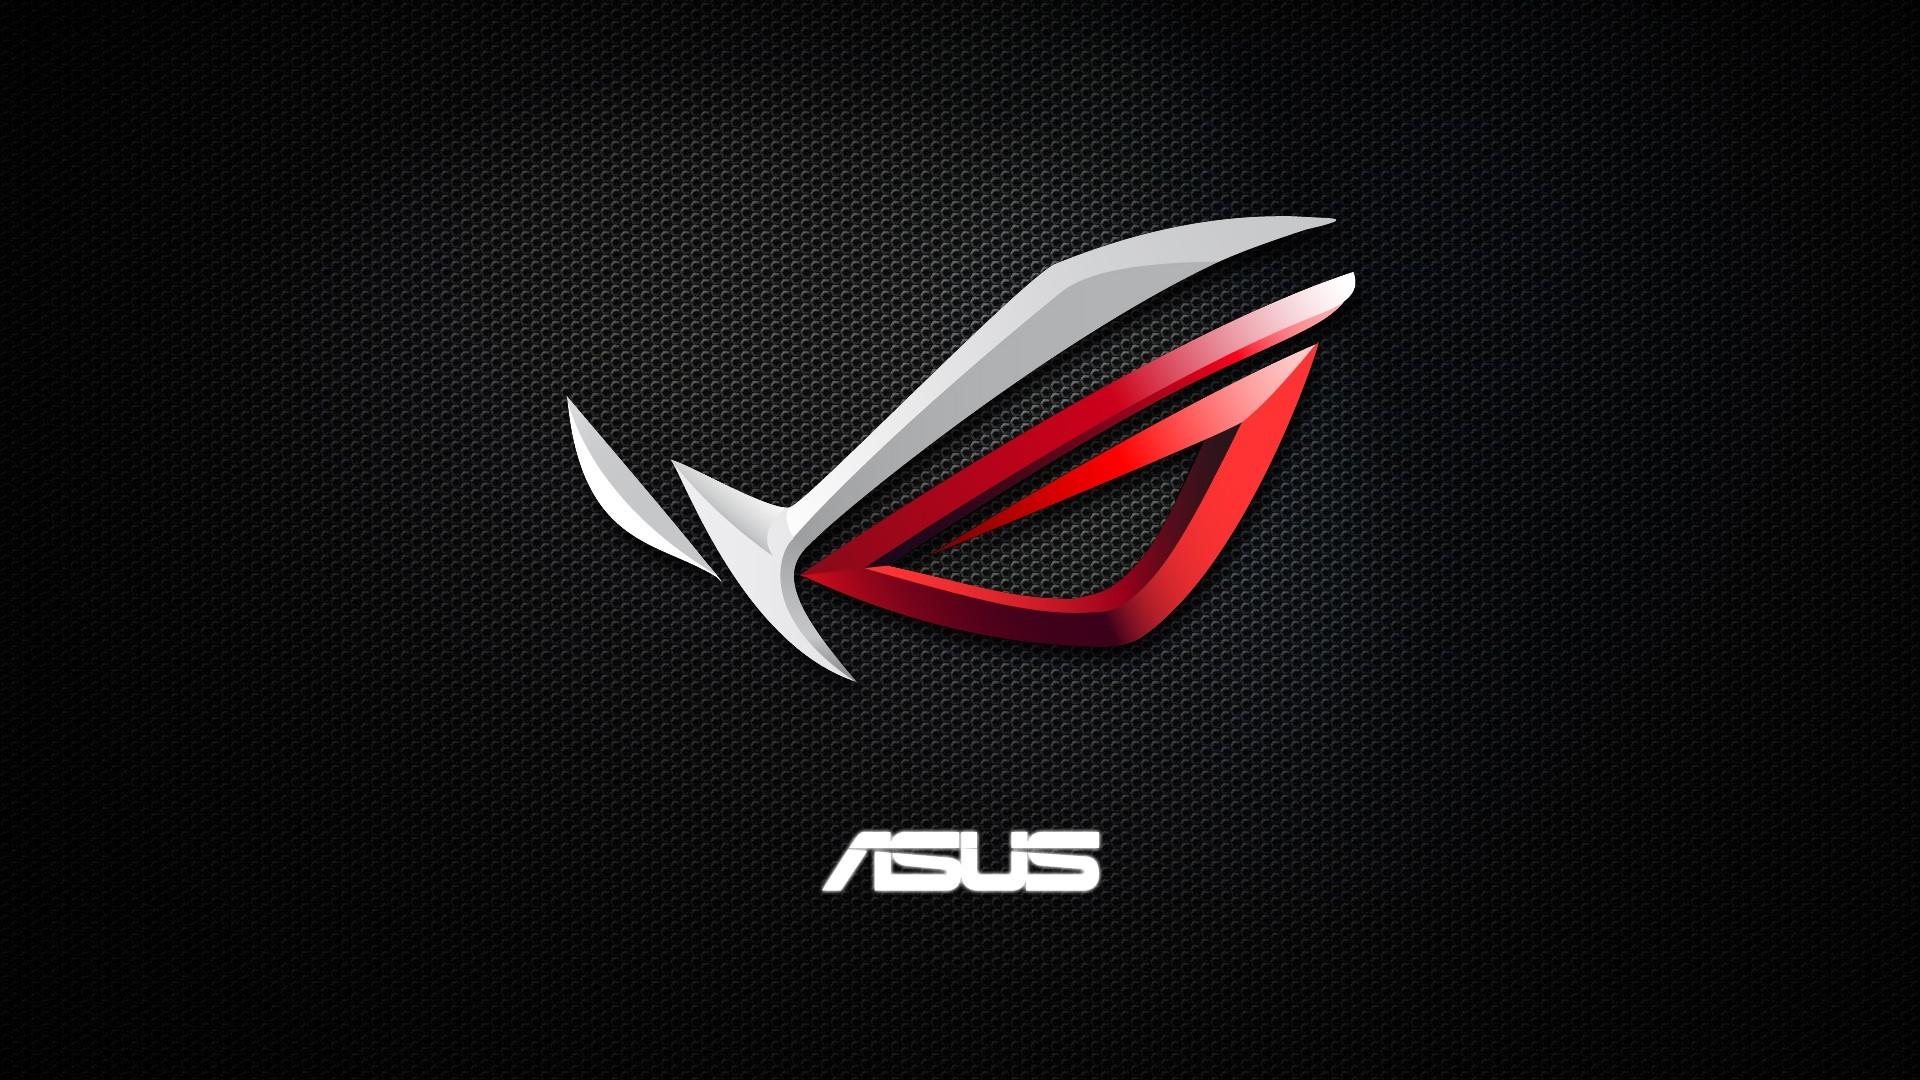 Asus Logos Wallpaper x Asus Logos